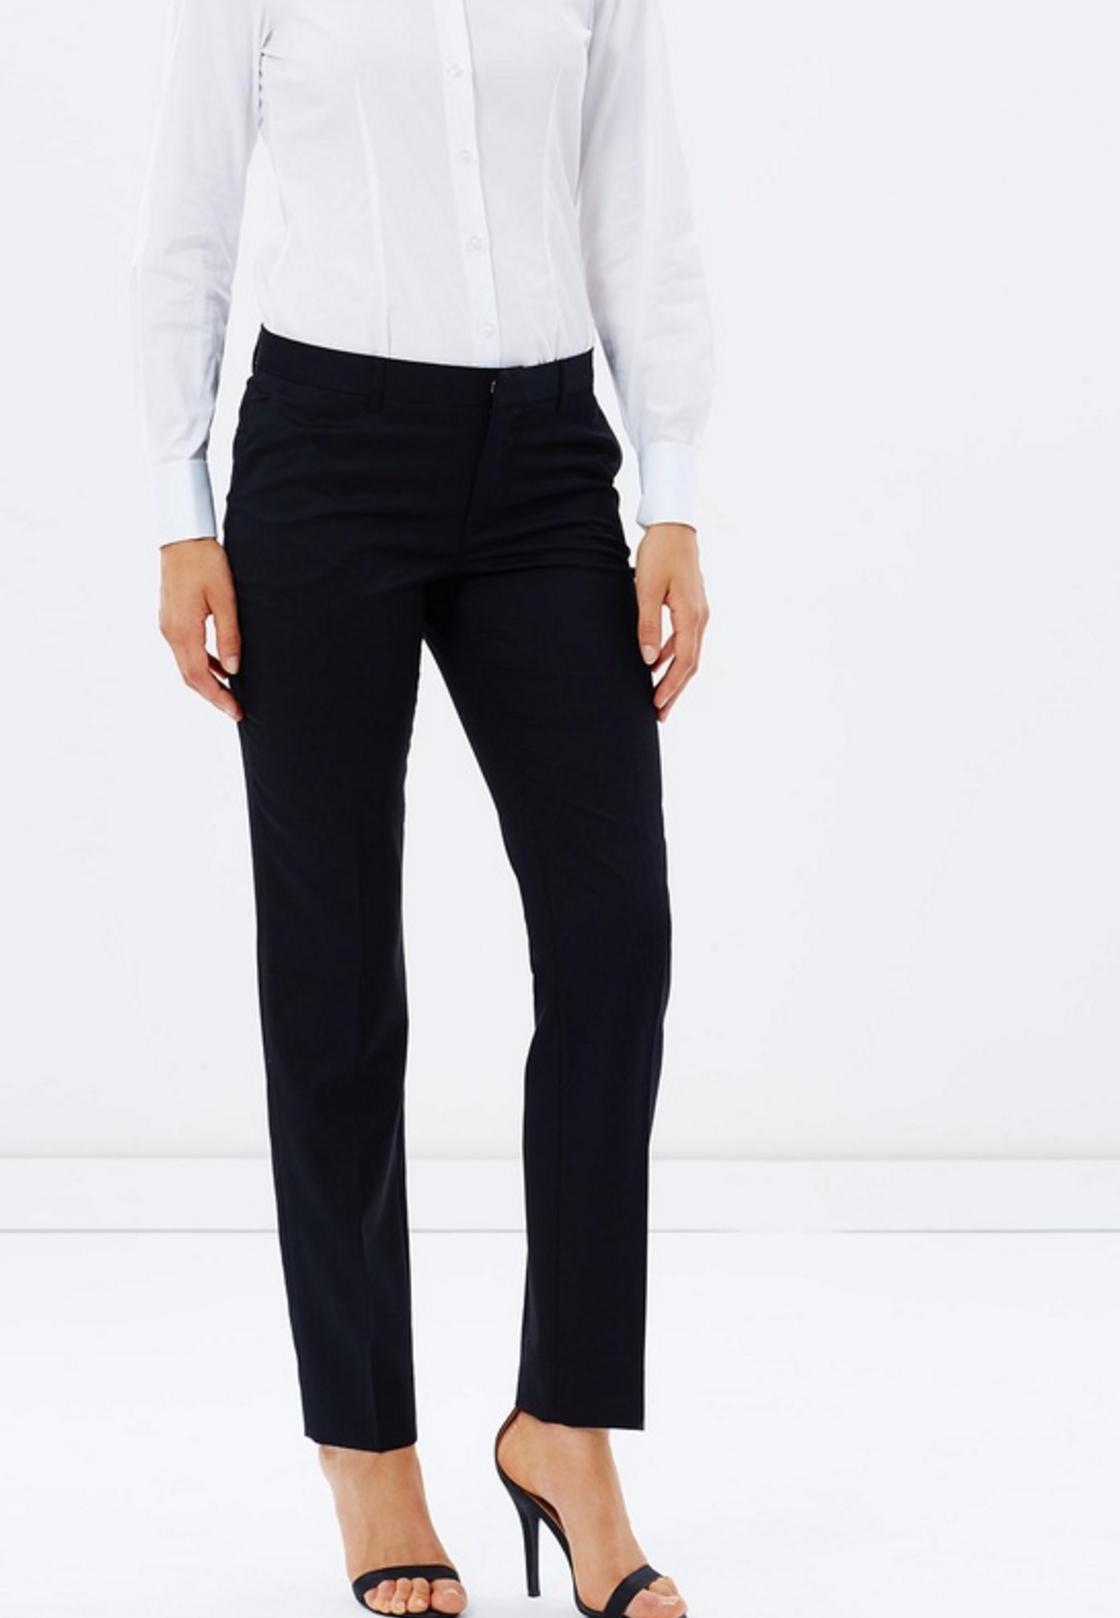 Farage Mia trousers $249